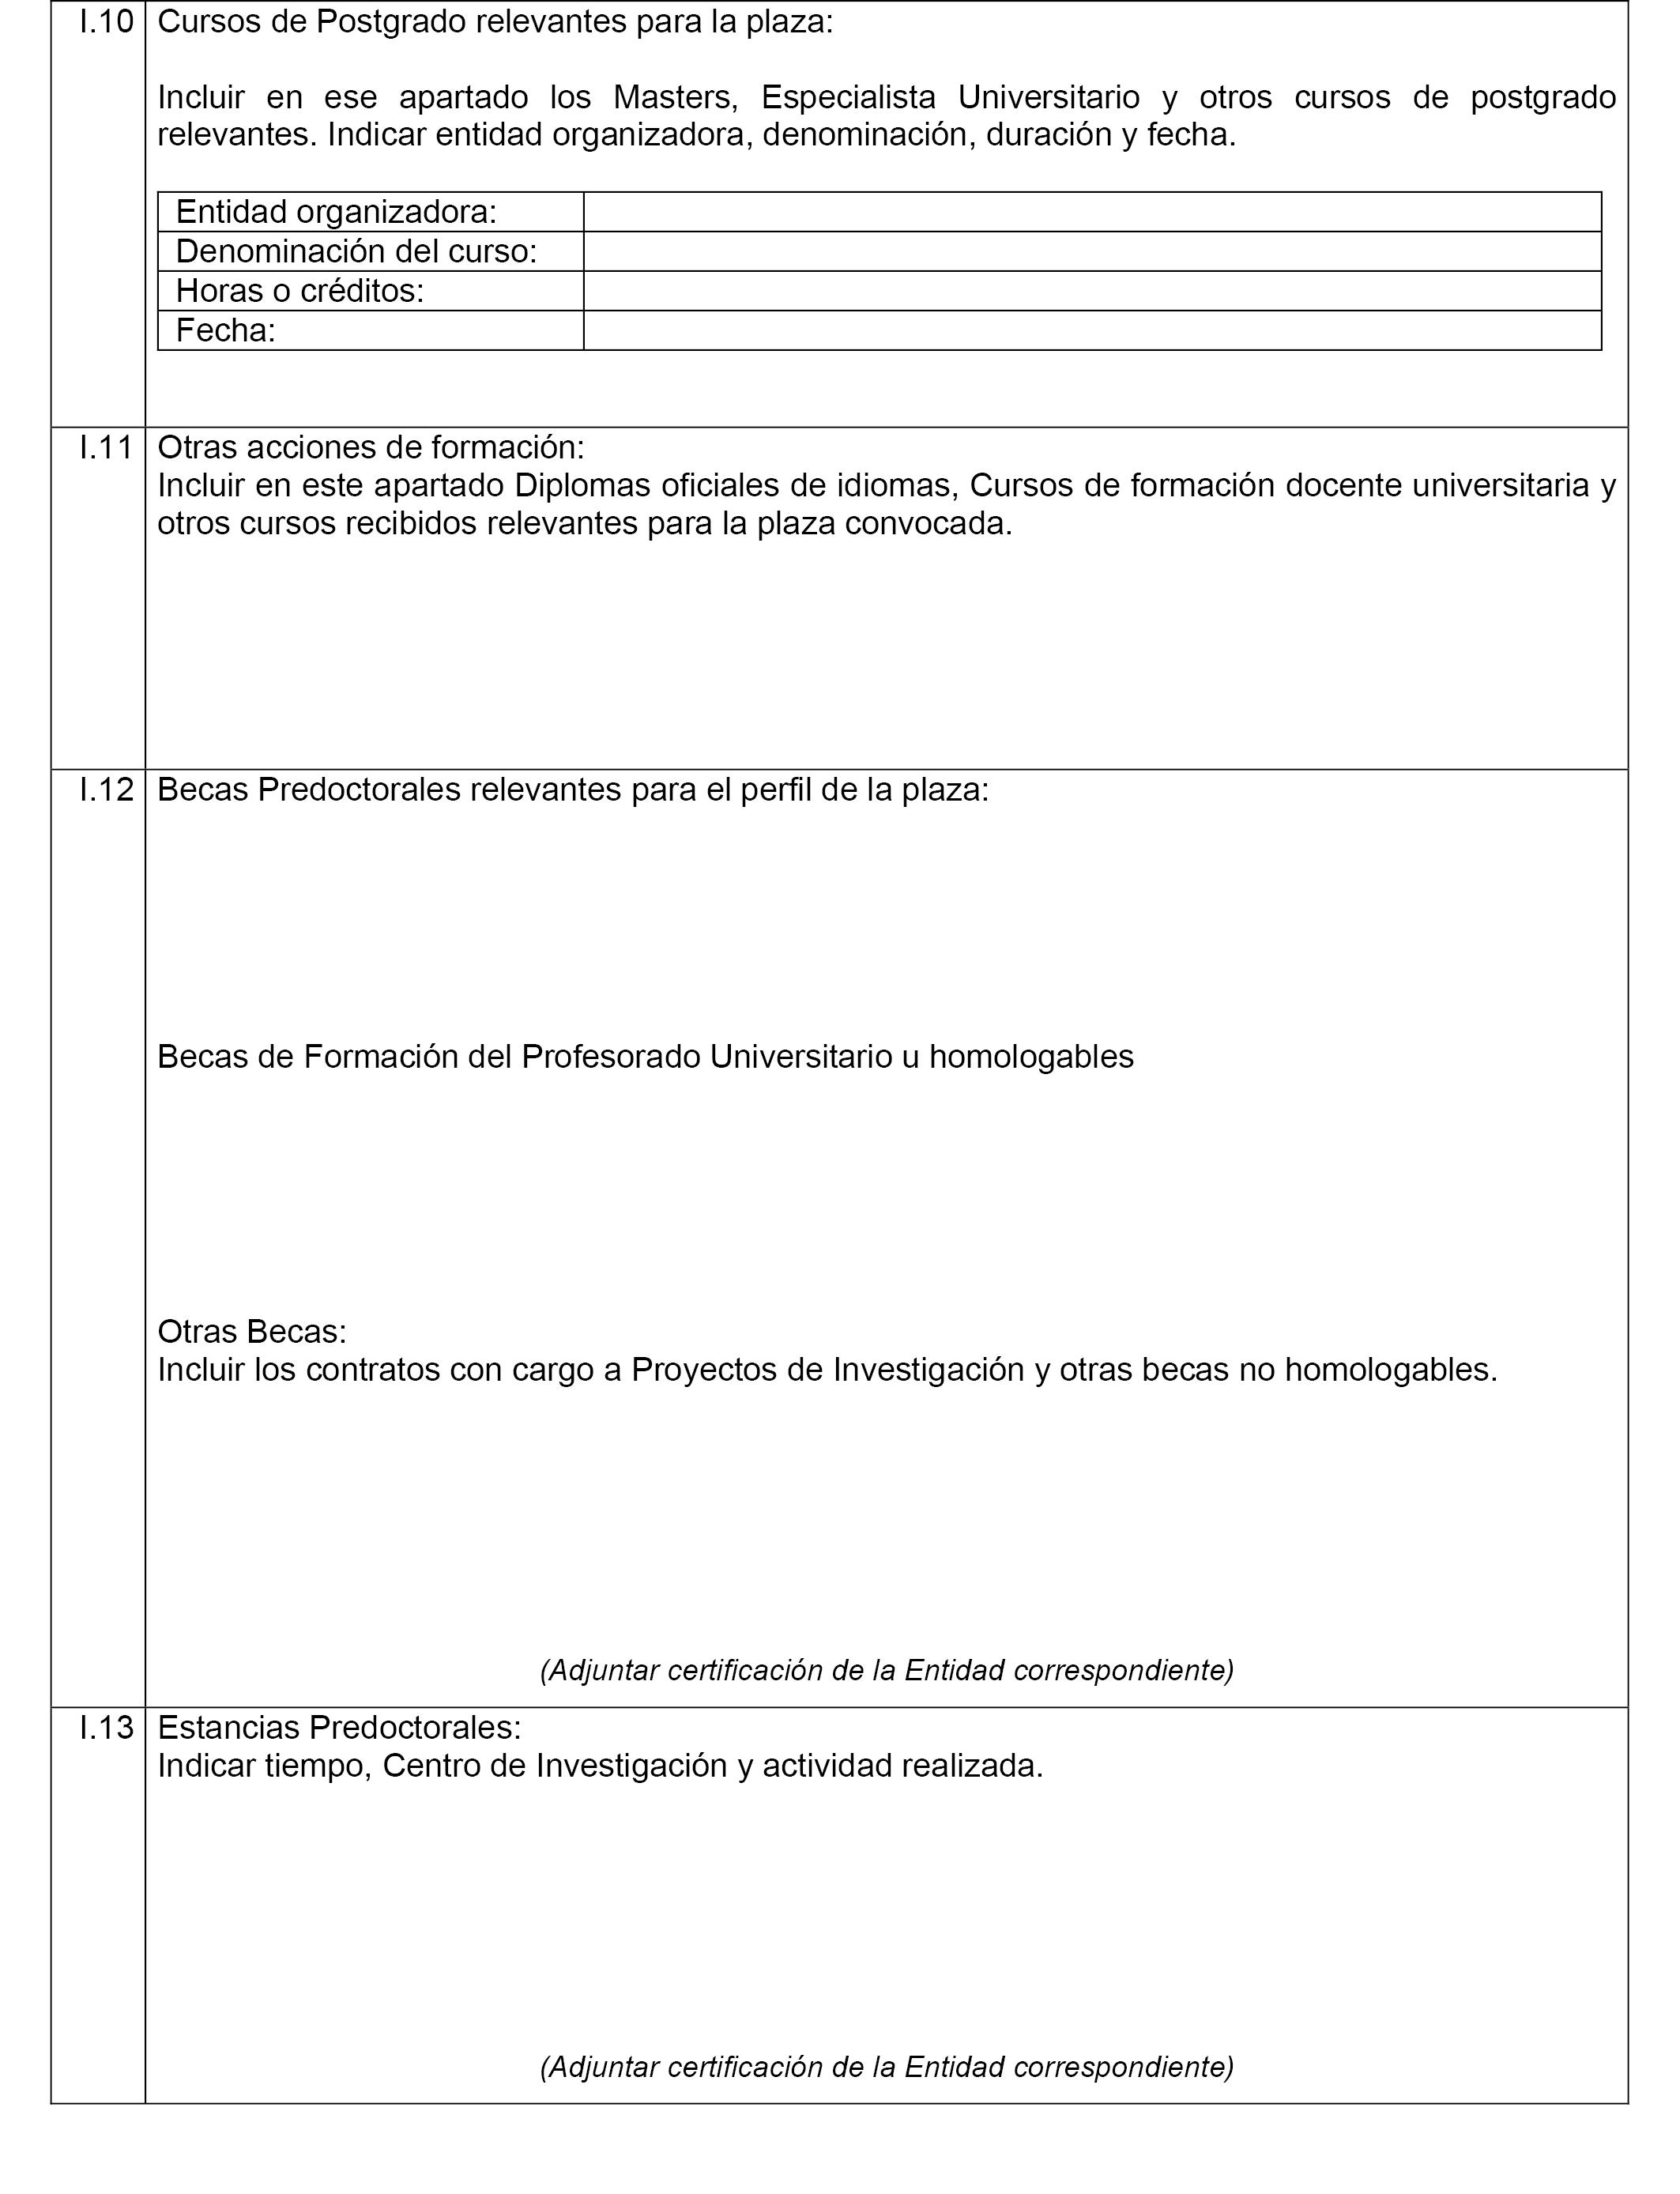 BOE.es - Documento BOE-A-2018-11649